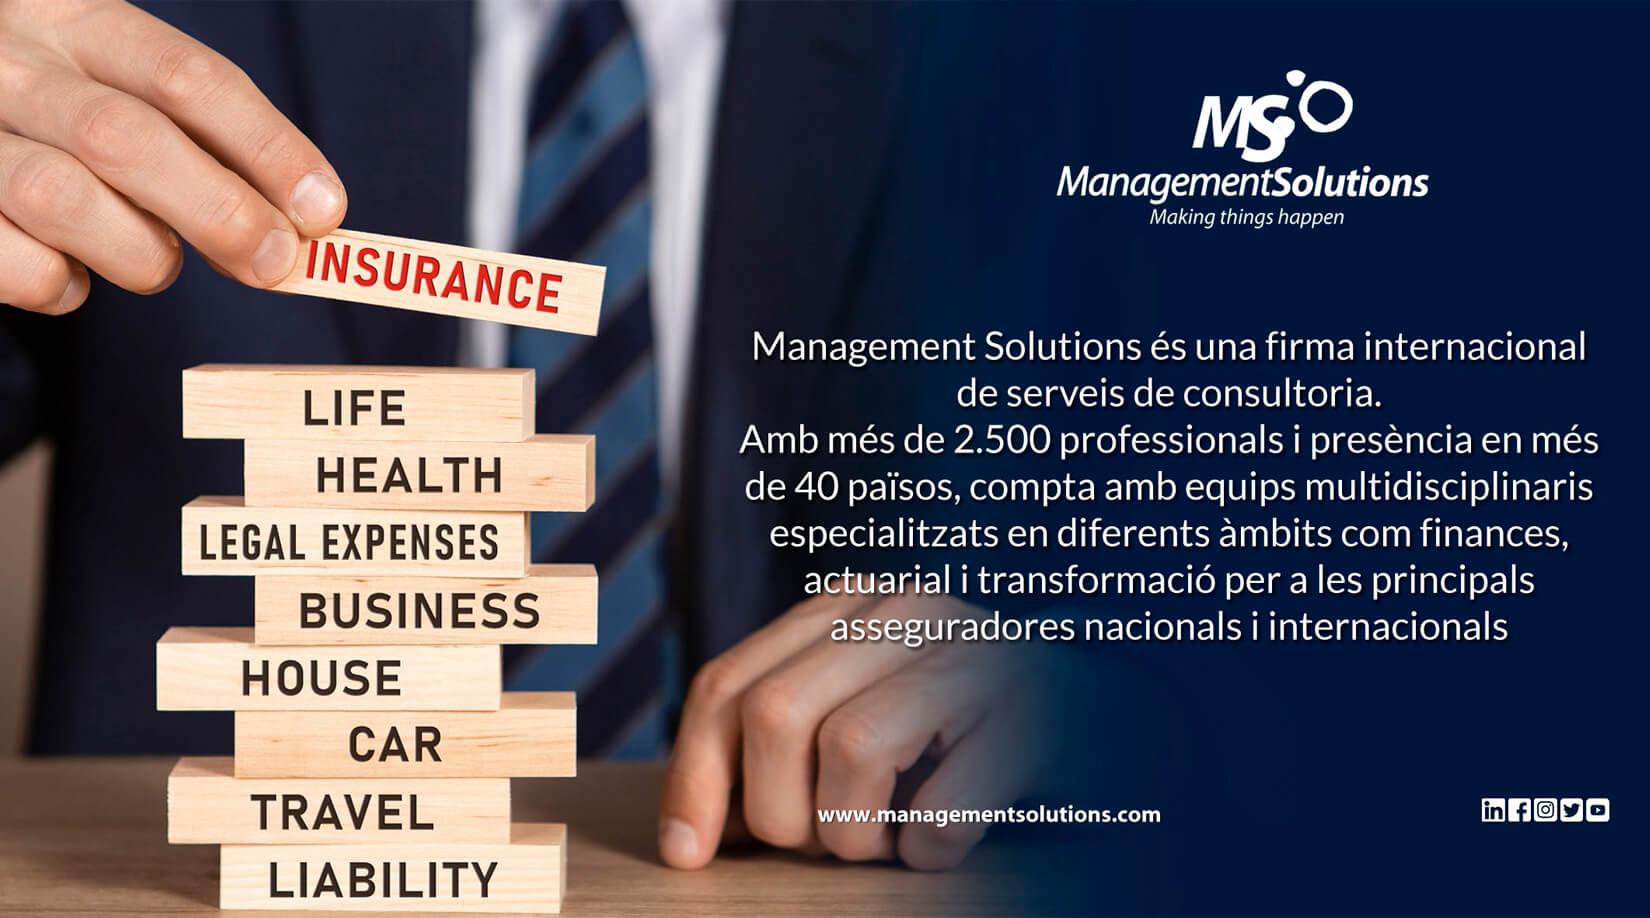 ManagementSolutions